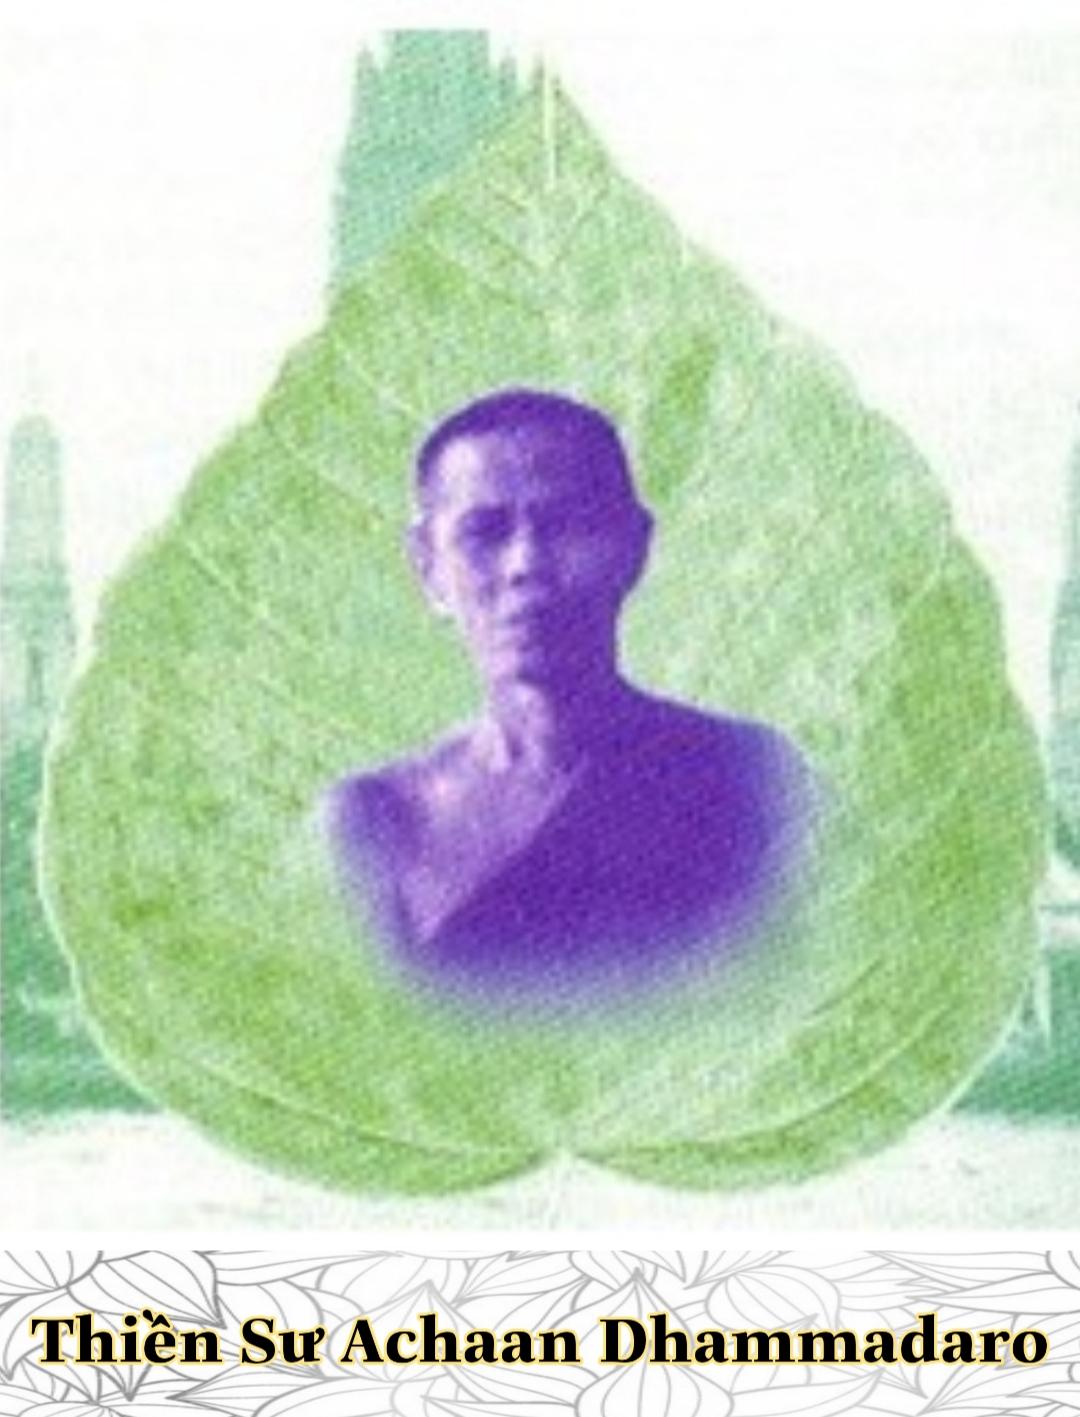 Thiền sư Achaan Dhammadaro 1